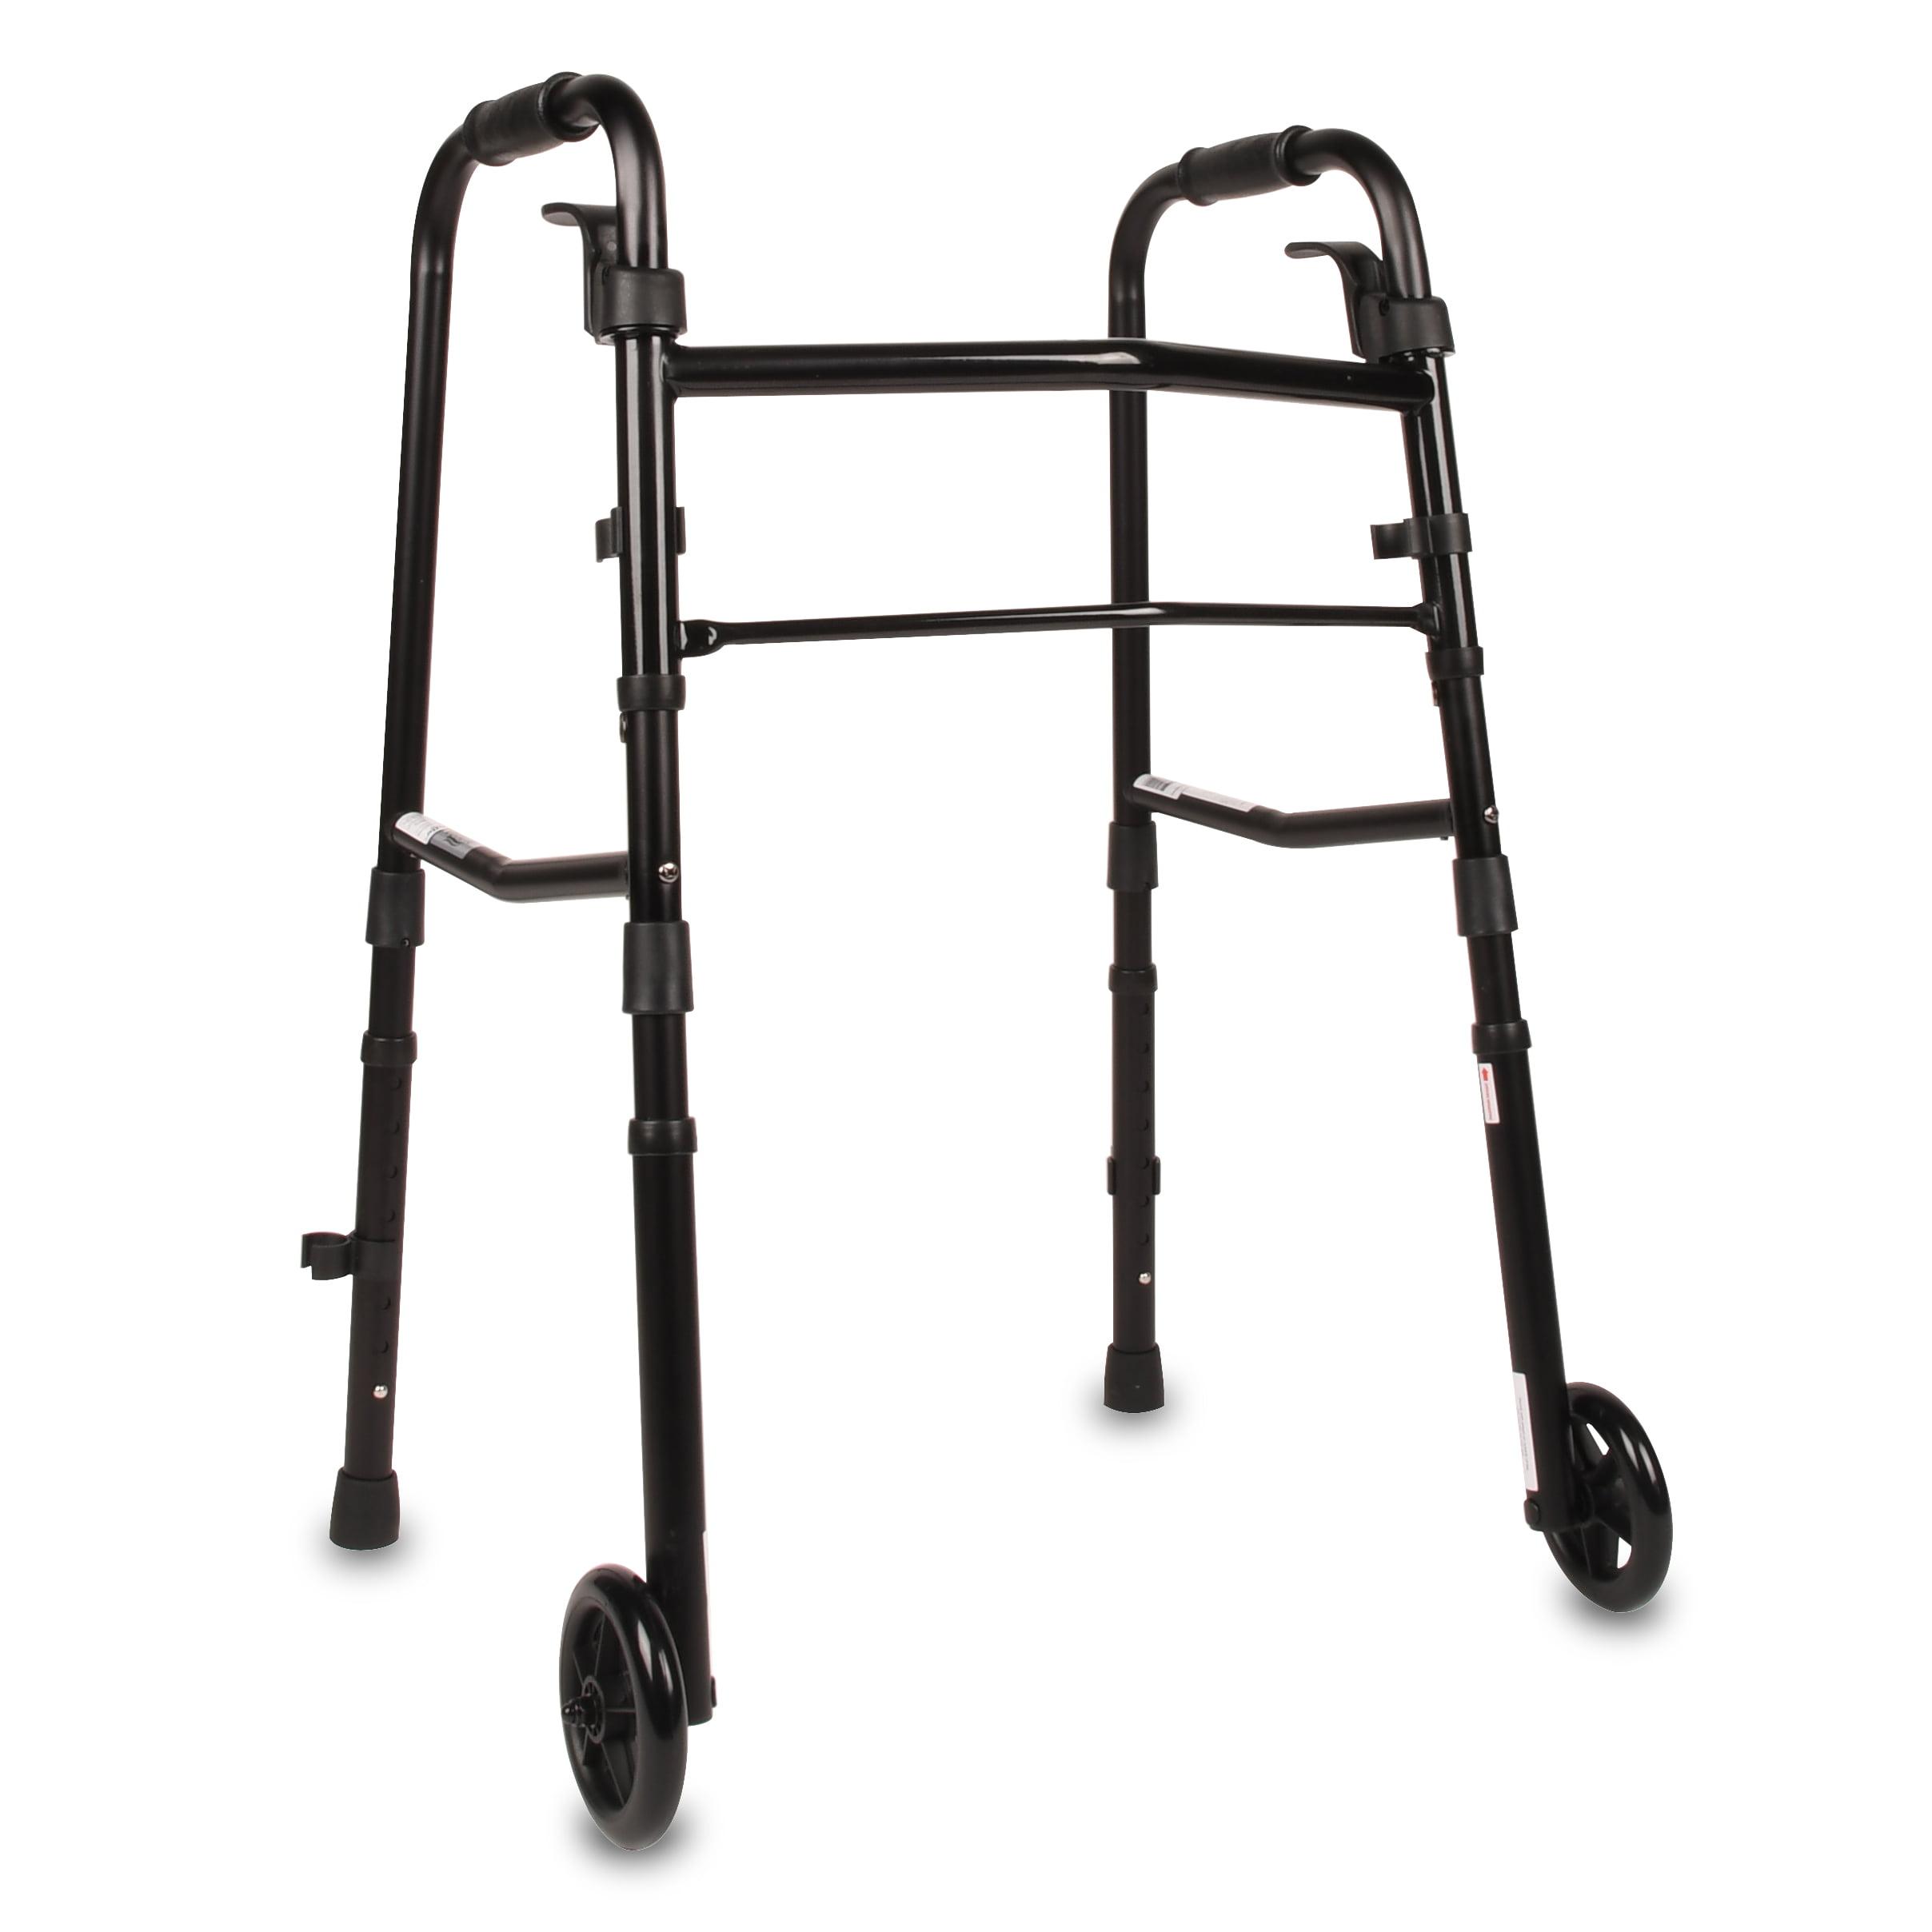 Equate Folding Walker with Wheels, Black